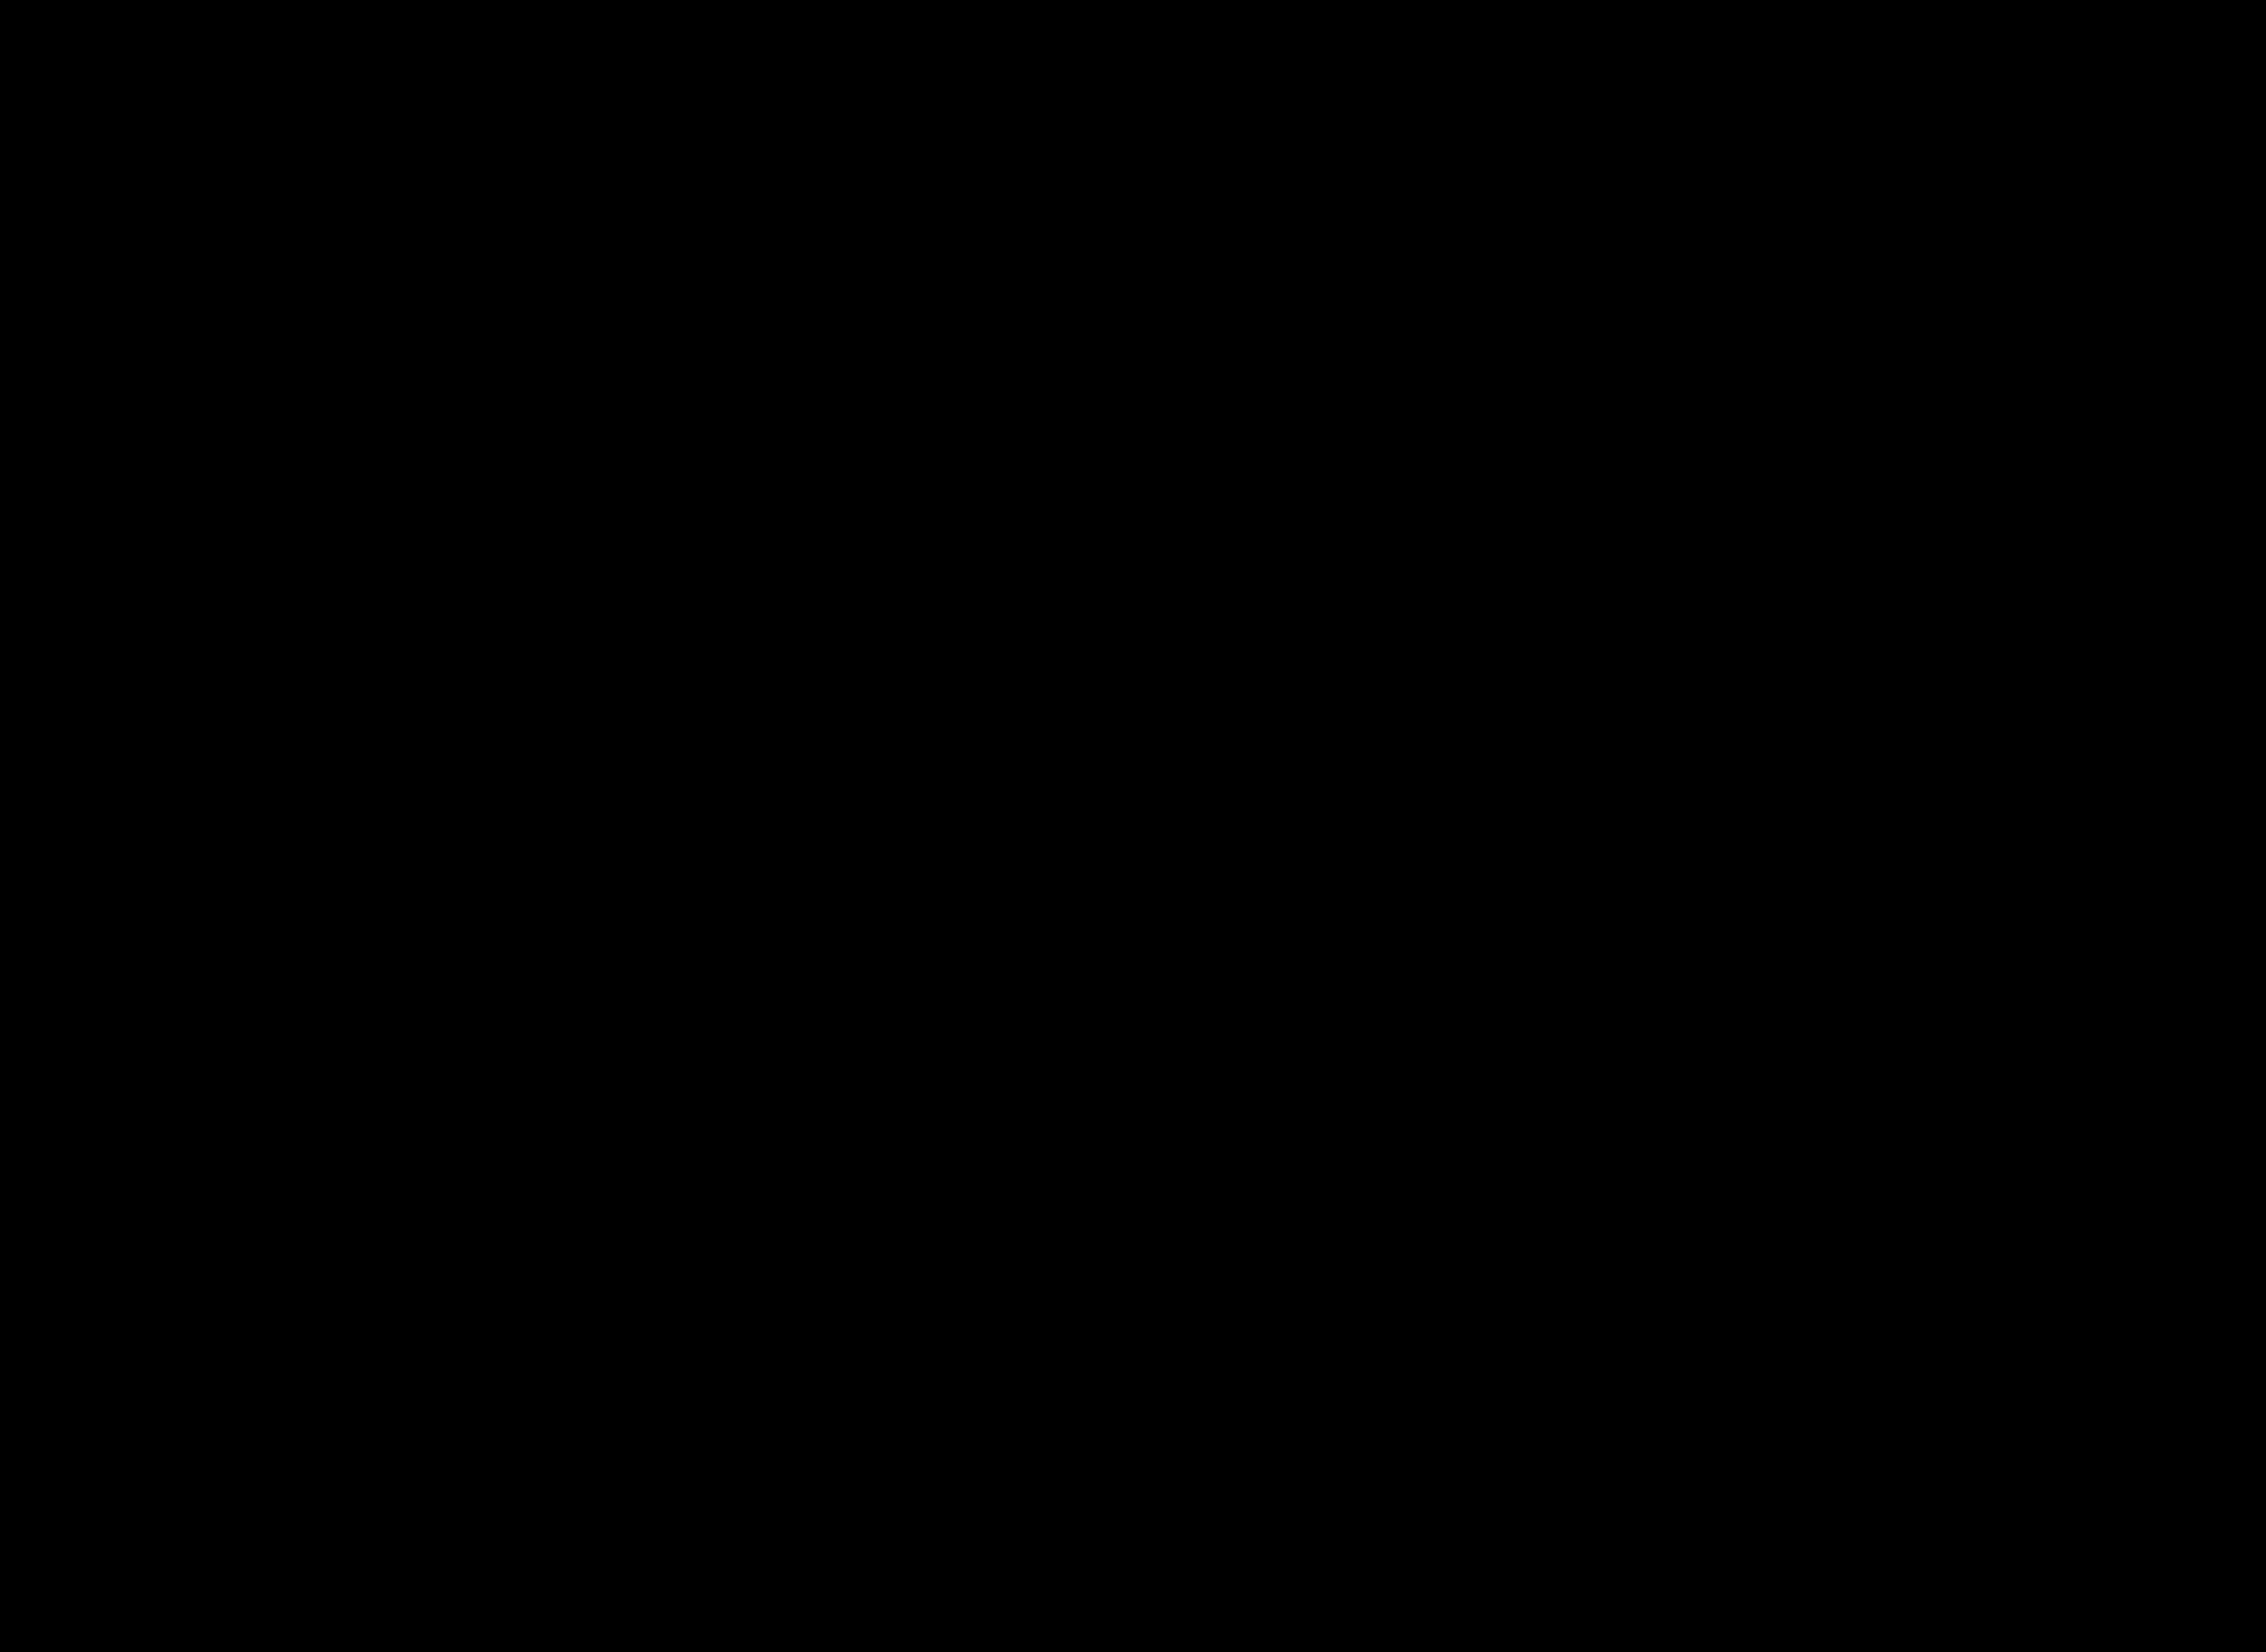 THE STORM_136.jpg